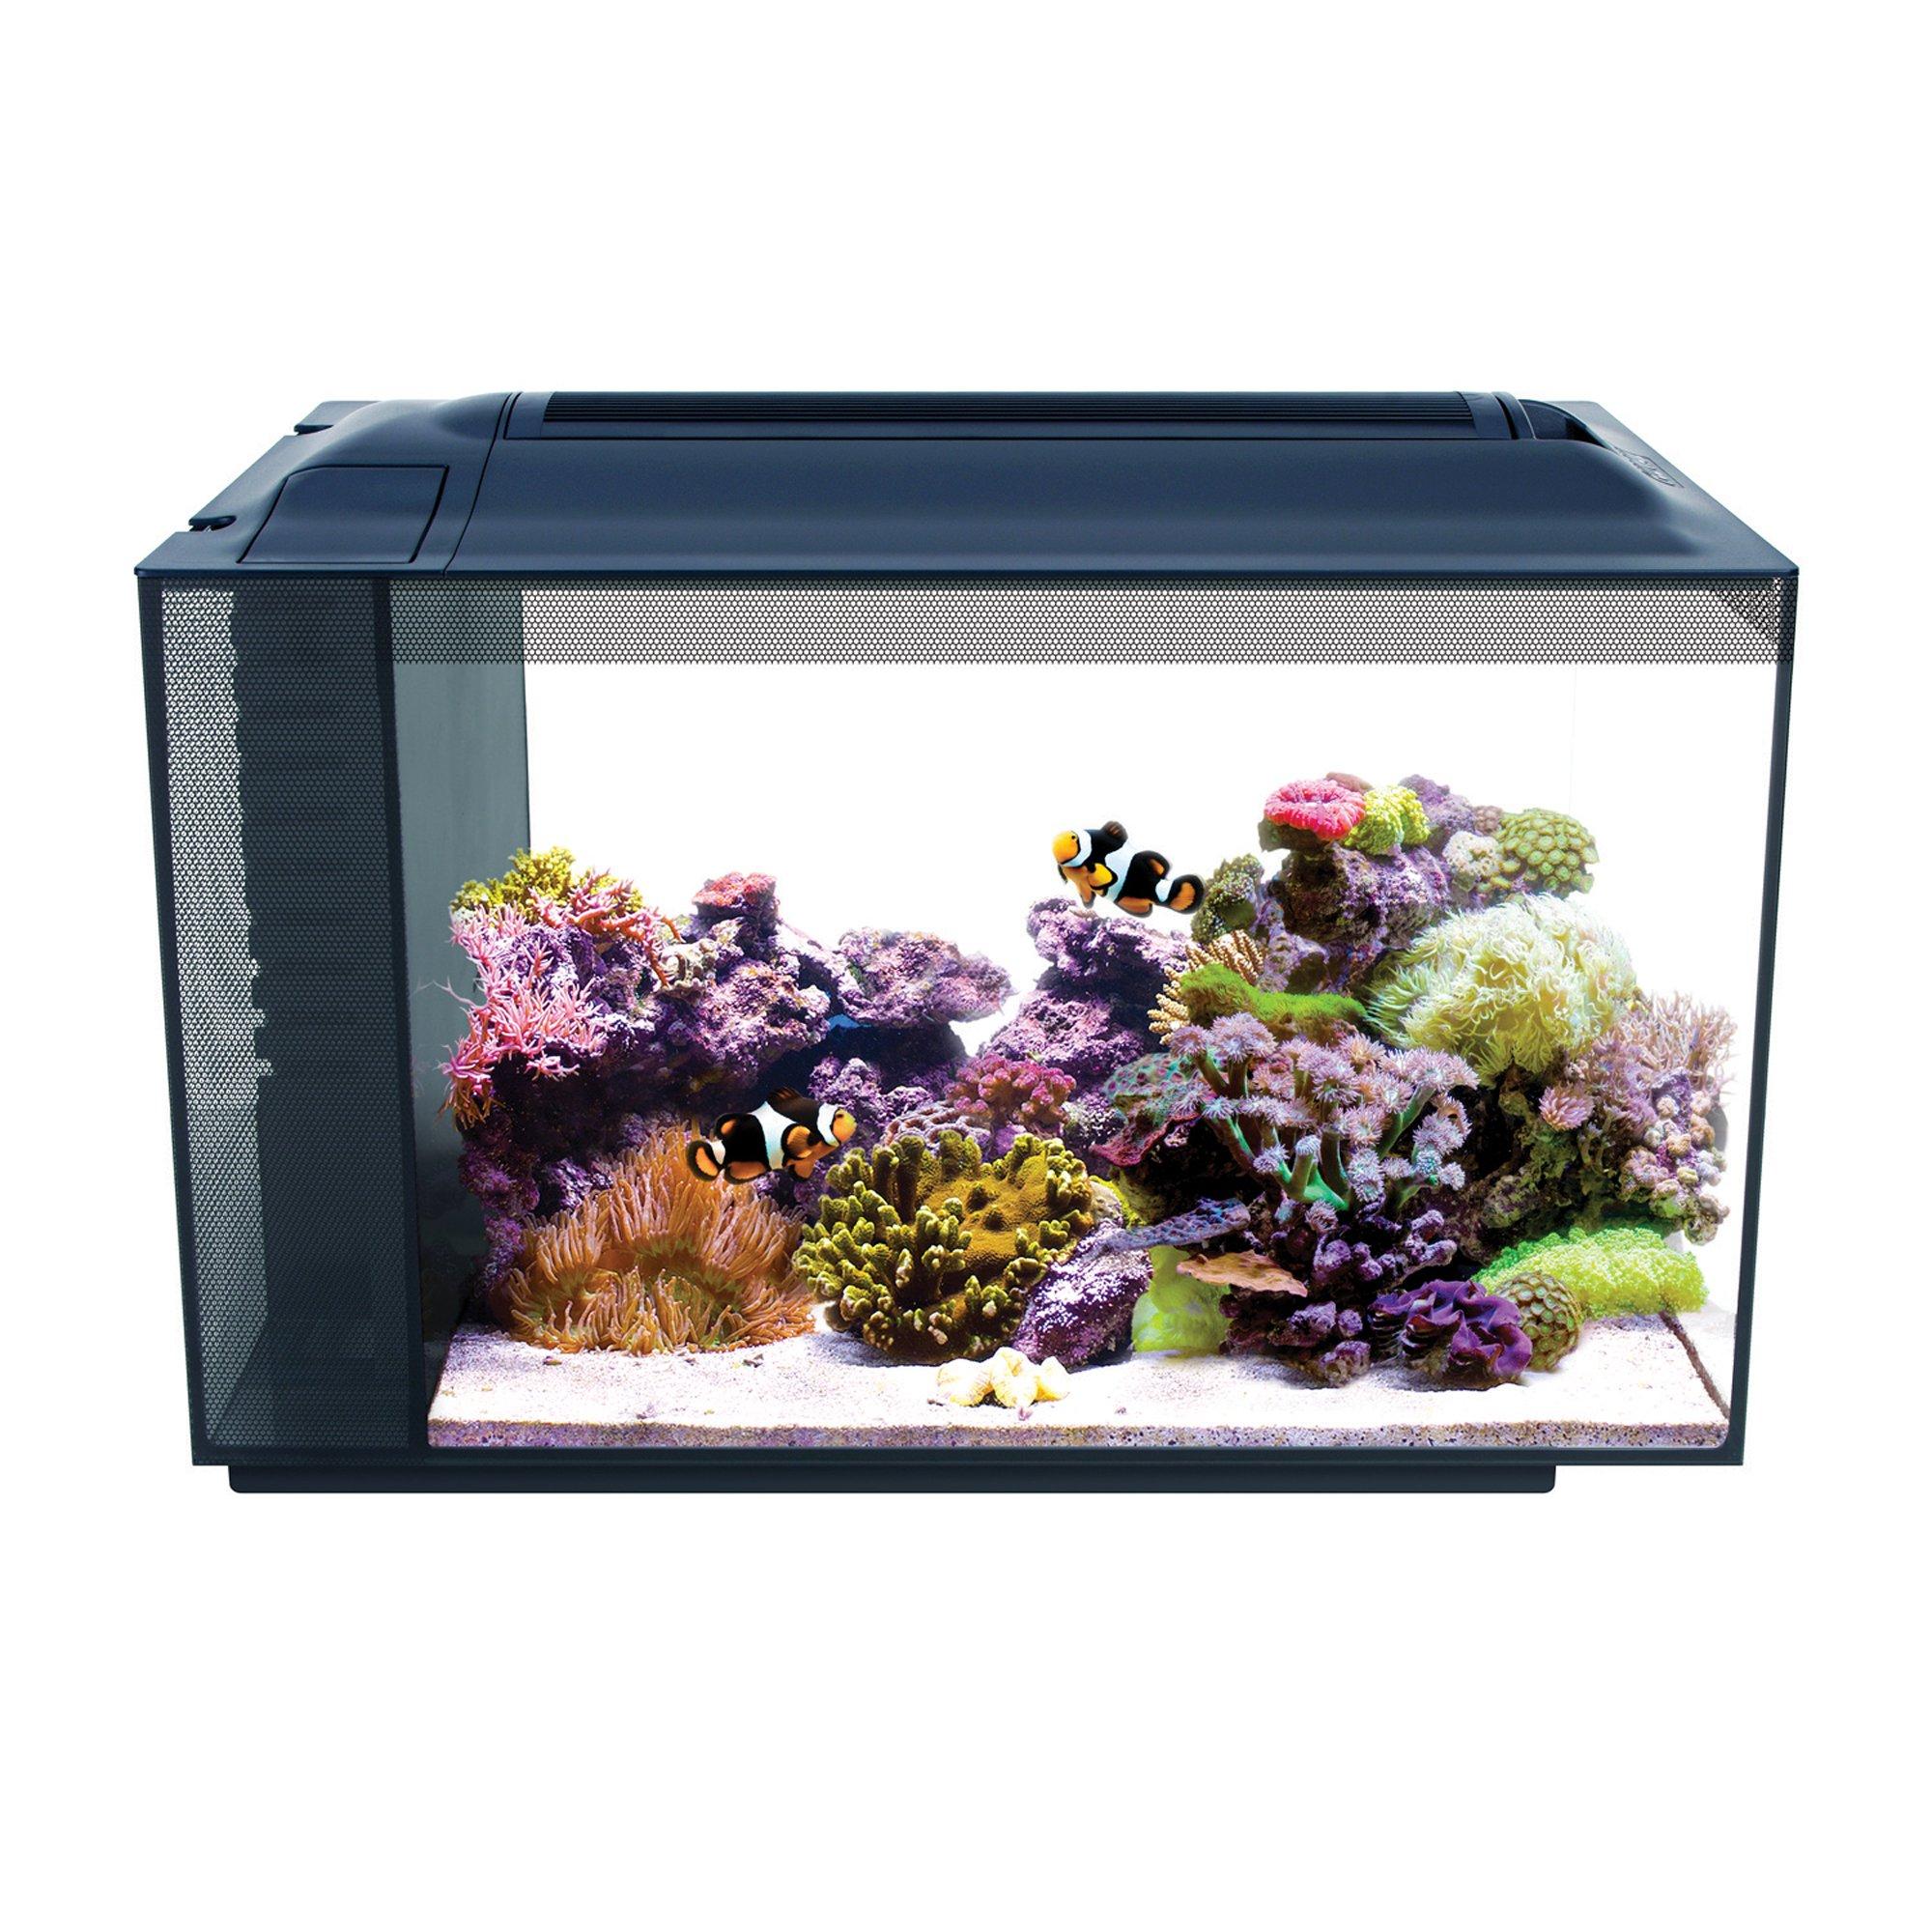 Fluval evo xii marine aquarium kit petco for Petco small fish tank